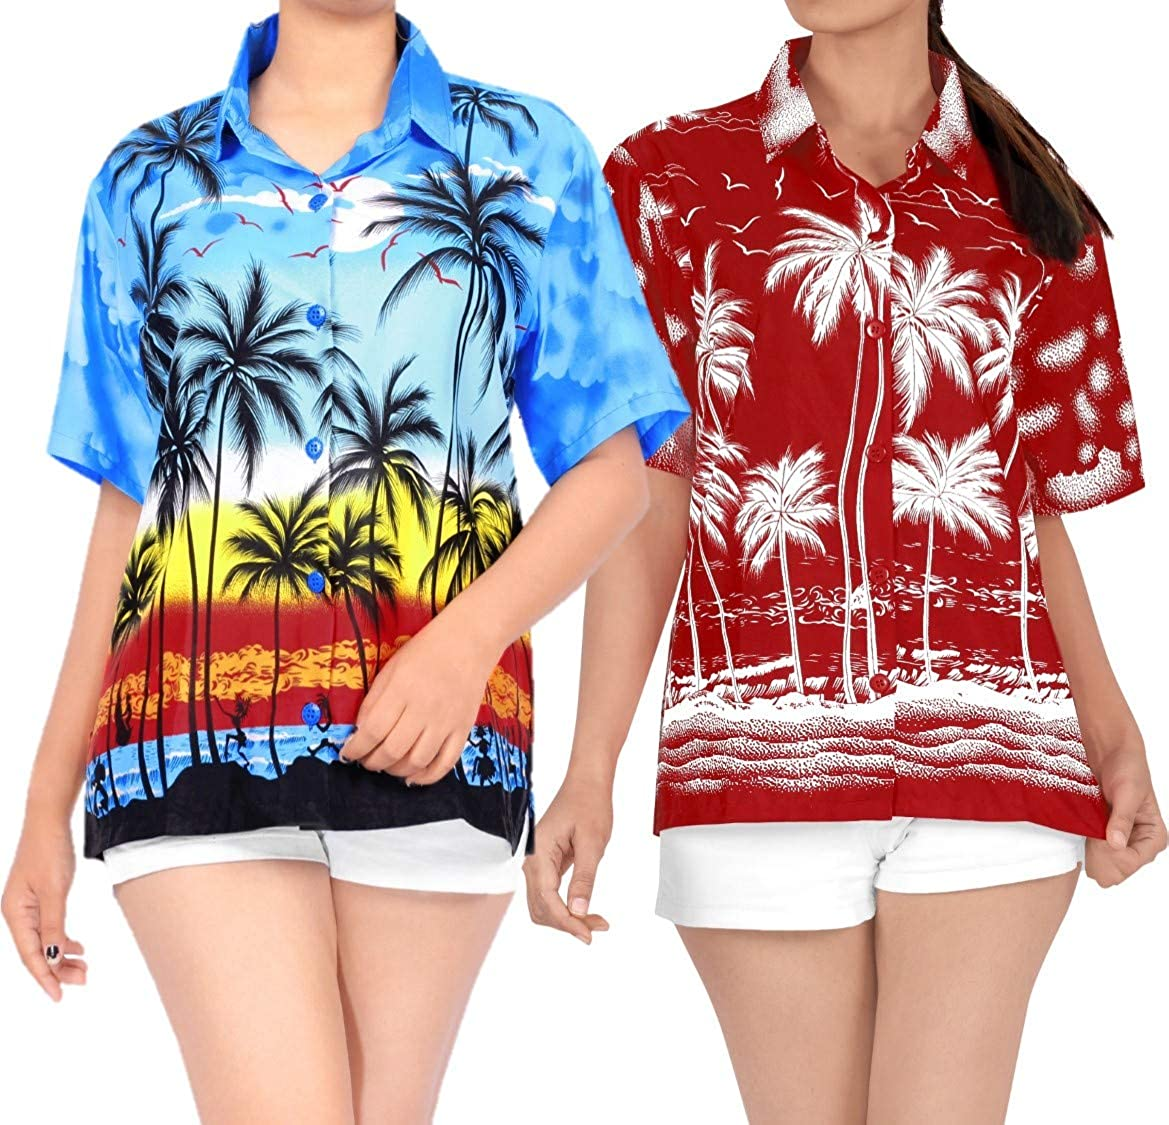 LA LEELA Women's Relaxed Swim Hawaiian Shirt Aloha Blouse Tops Shirt Work from Home Clothes Women Beach Shirt Blouse Shirt Combo Pack of 2 Size L